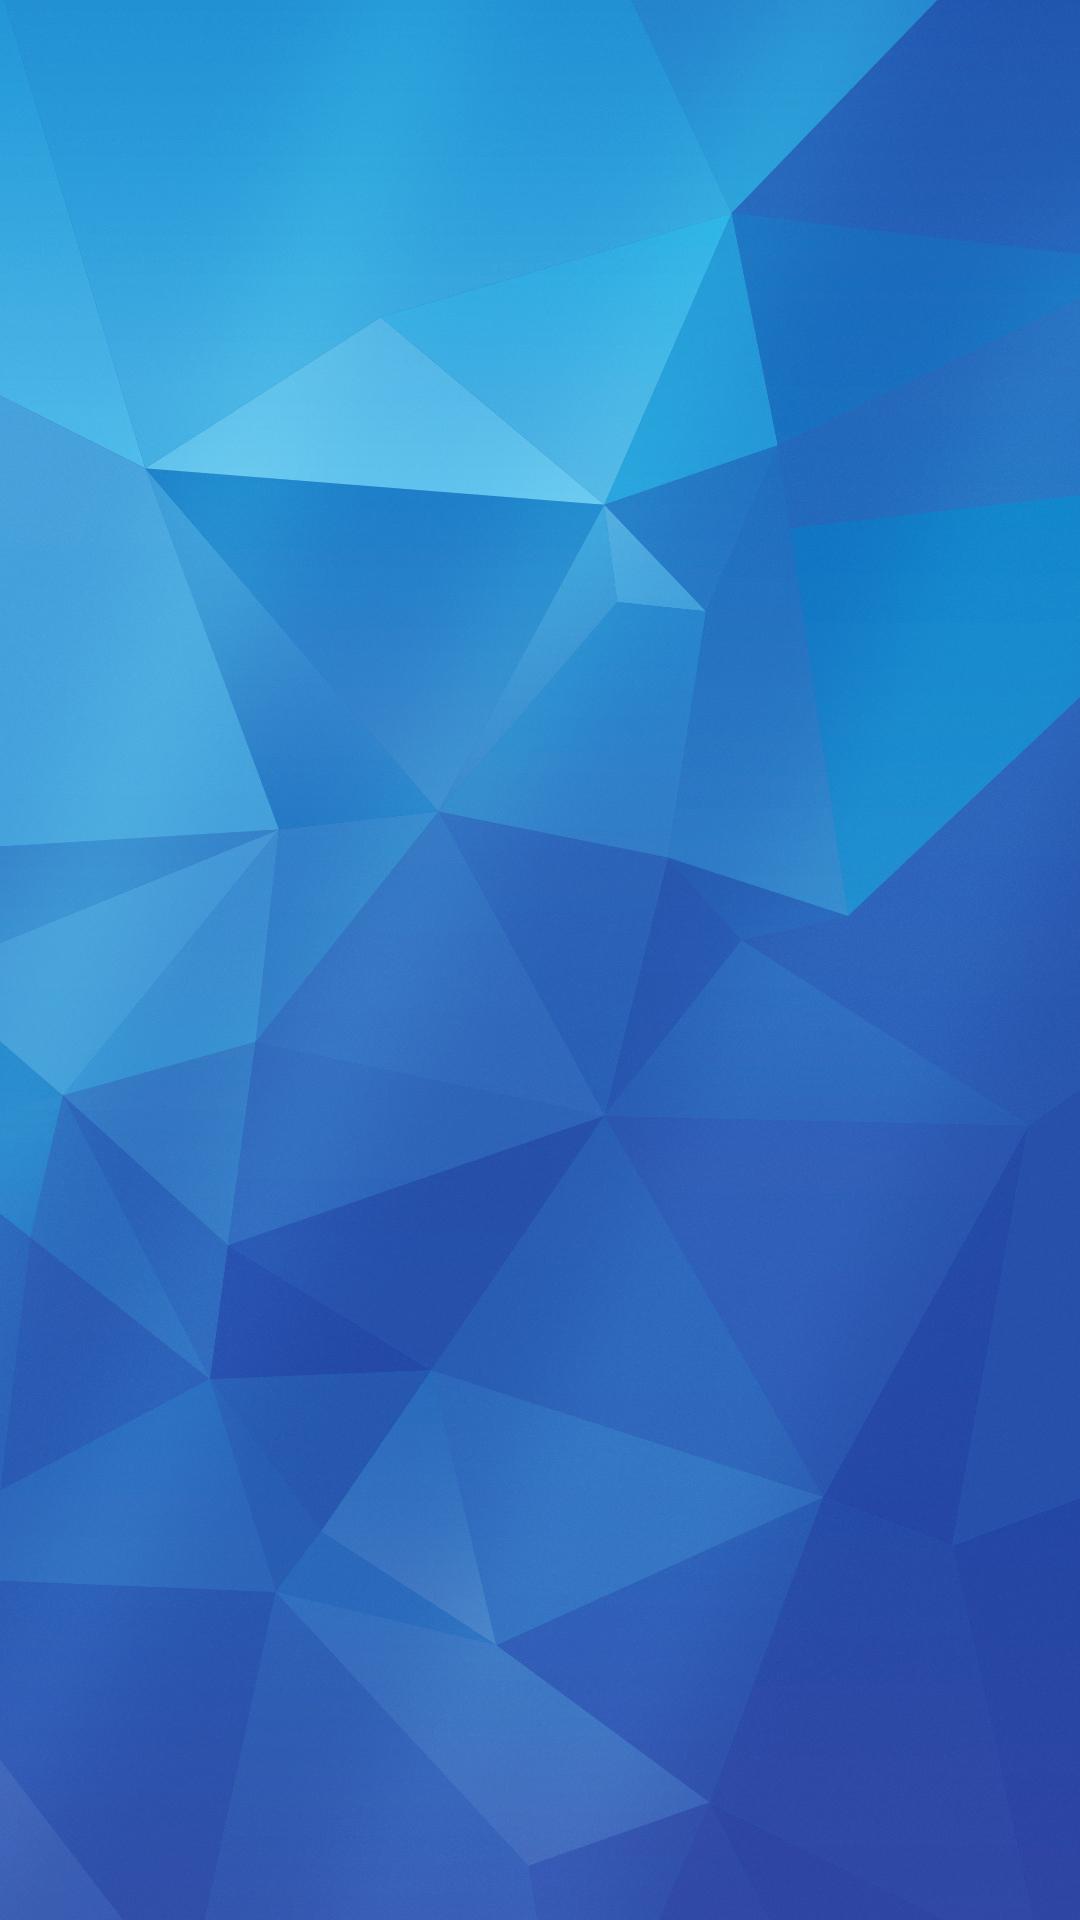 Blue Phone Wallpapers - WallpaperPulse